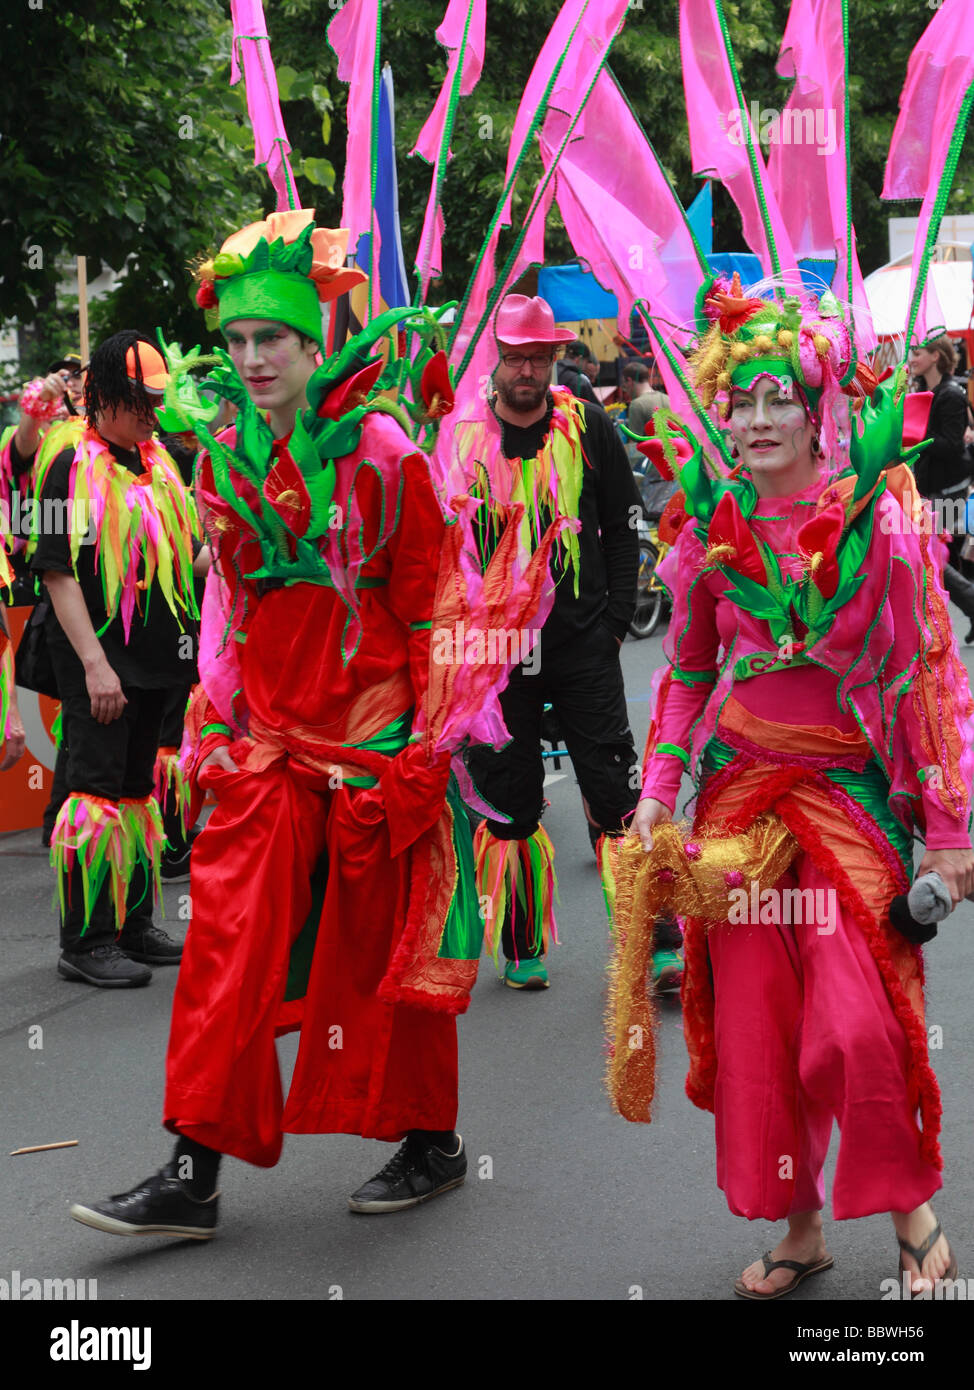 Deutschland Berlin Karneval der Kulturen paar in Tracht Stockbild